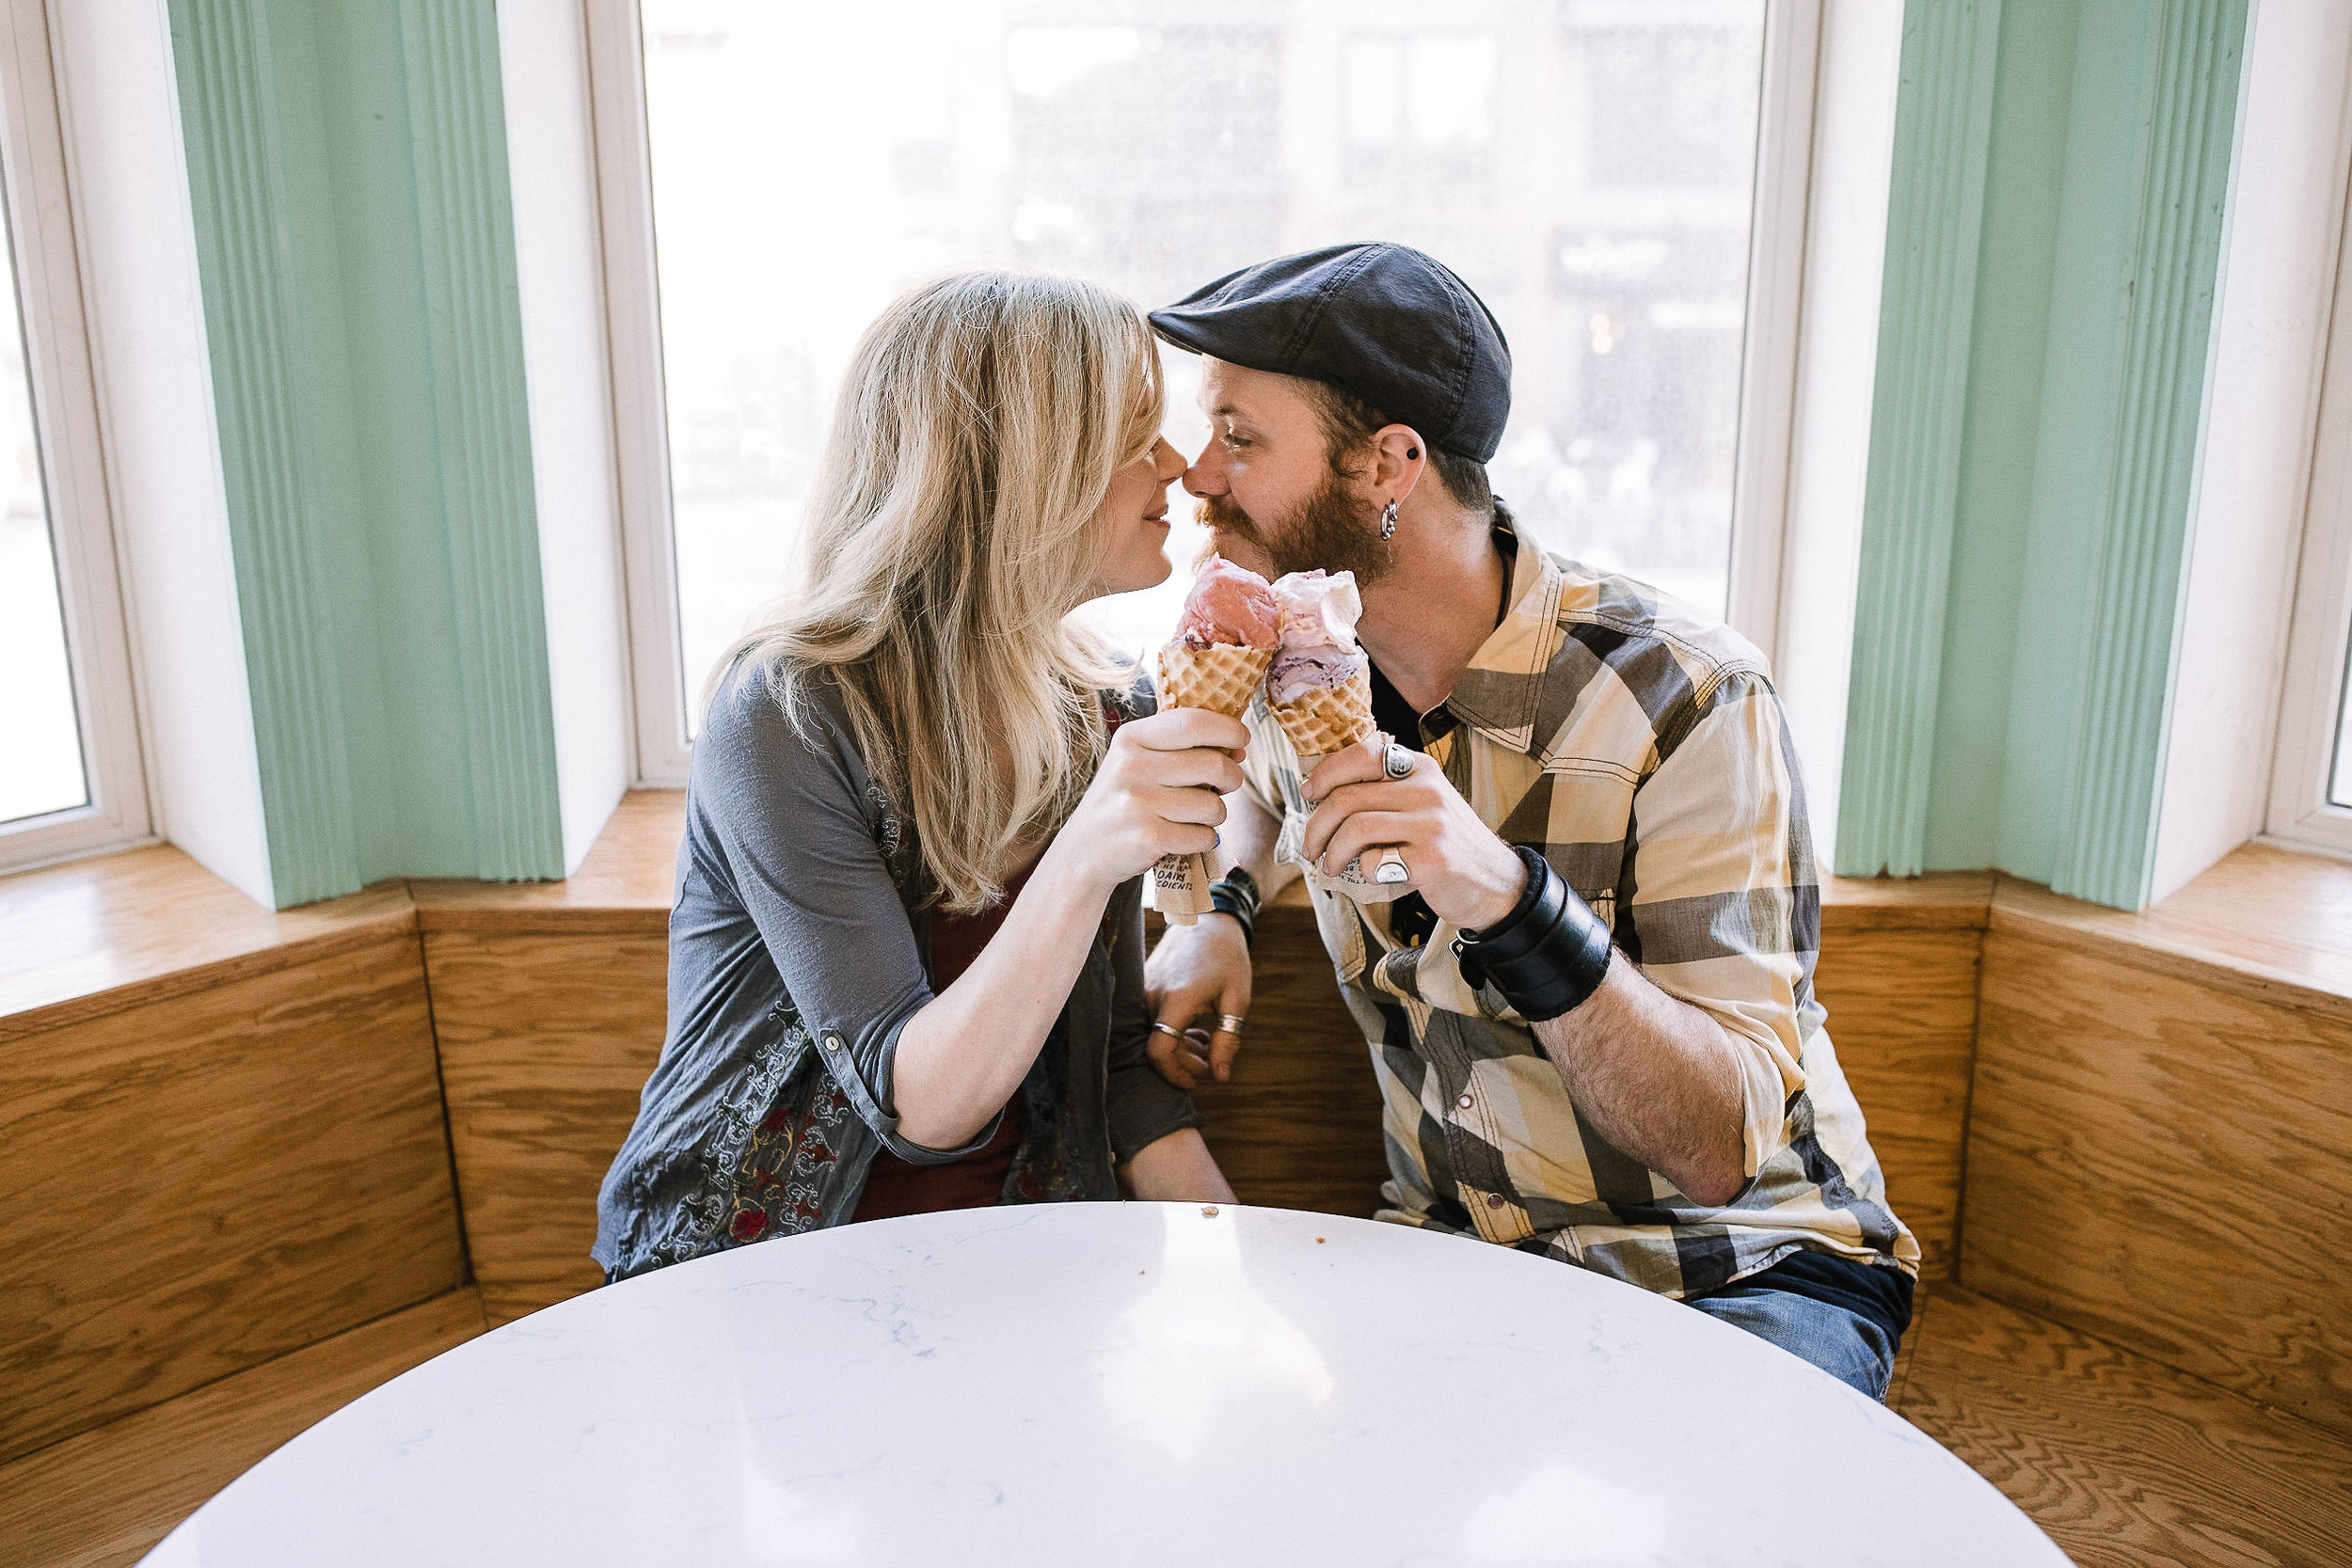 Jeni's Splendid Ice Creams Engagement Session in Washington, DC